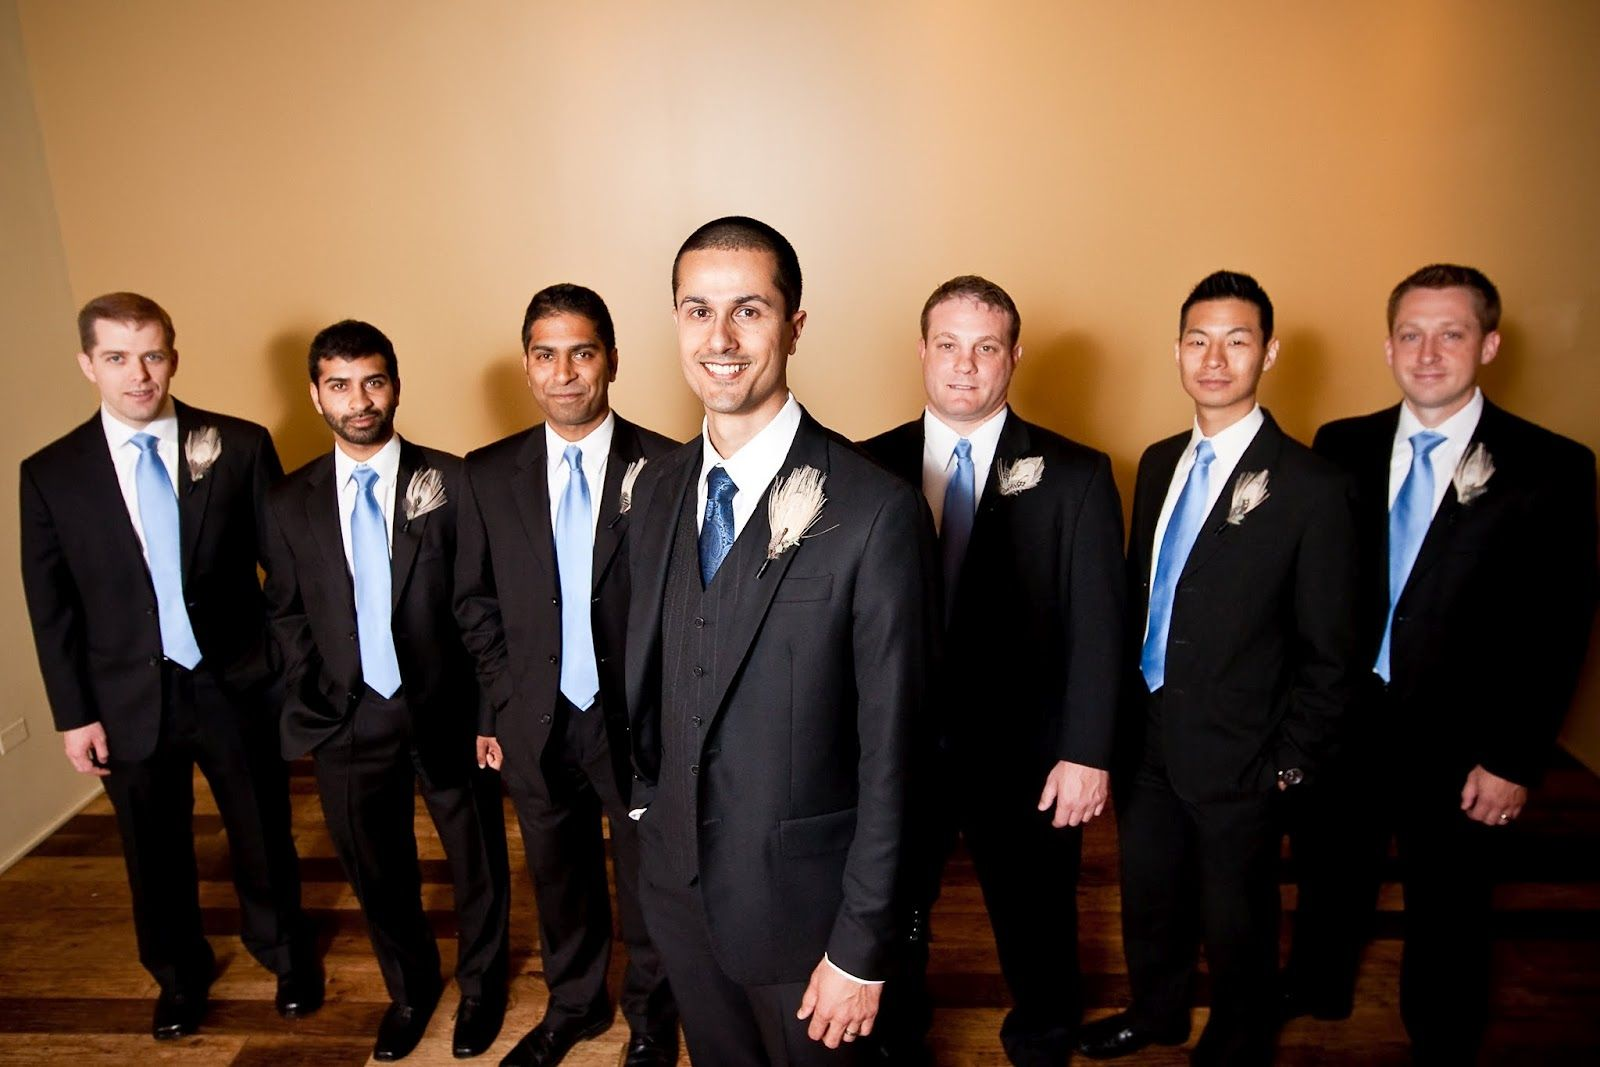 Black-suit-wedding-party.jpg 1600×1067 pixels | My Wedding Board ...